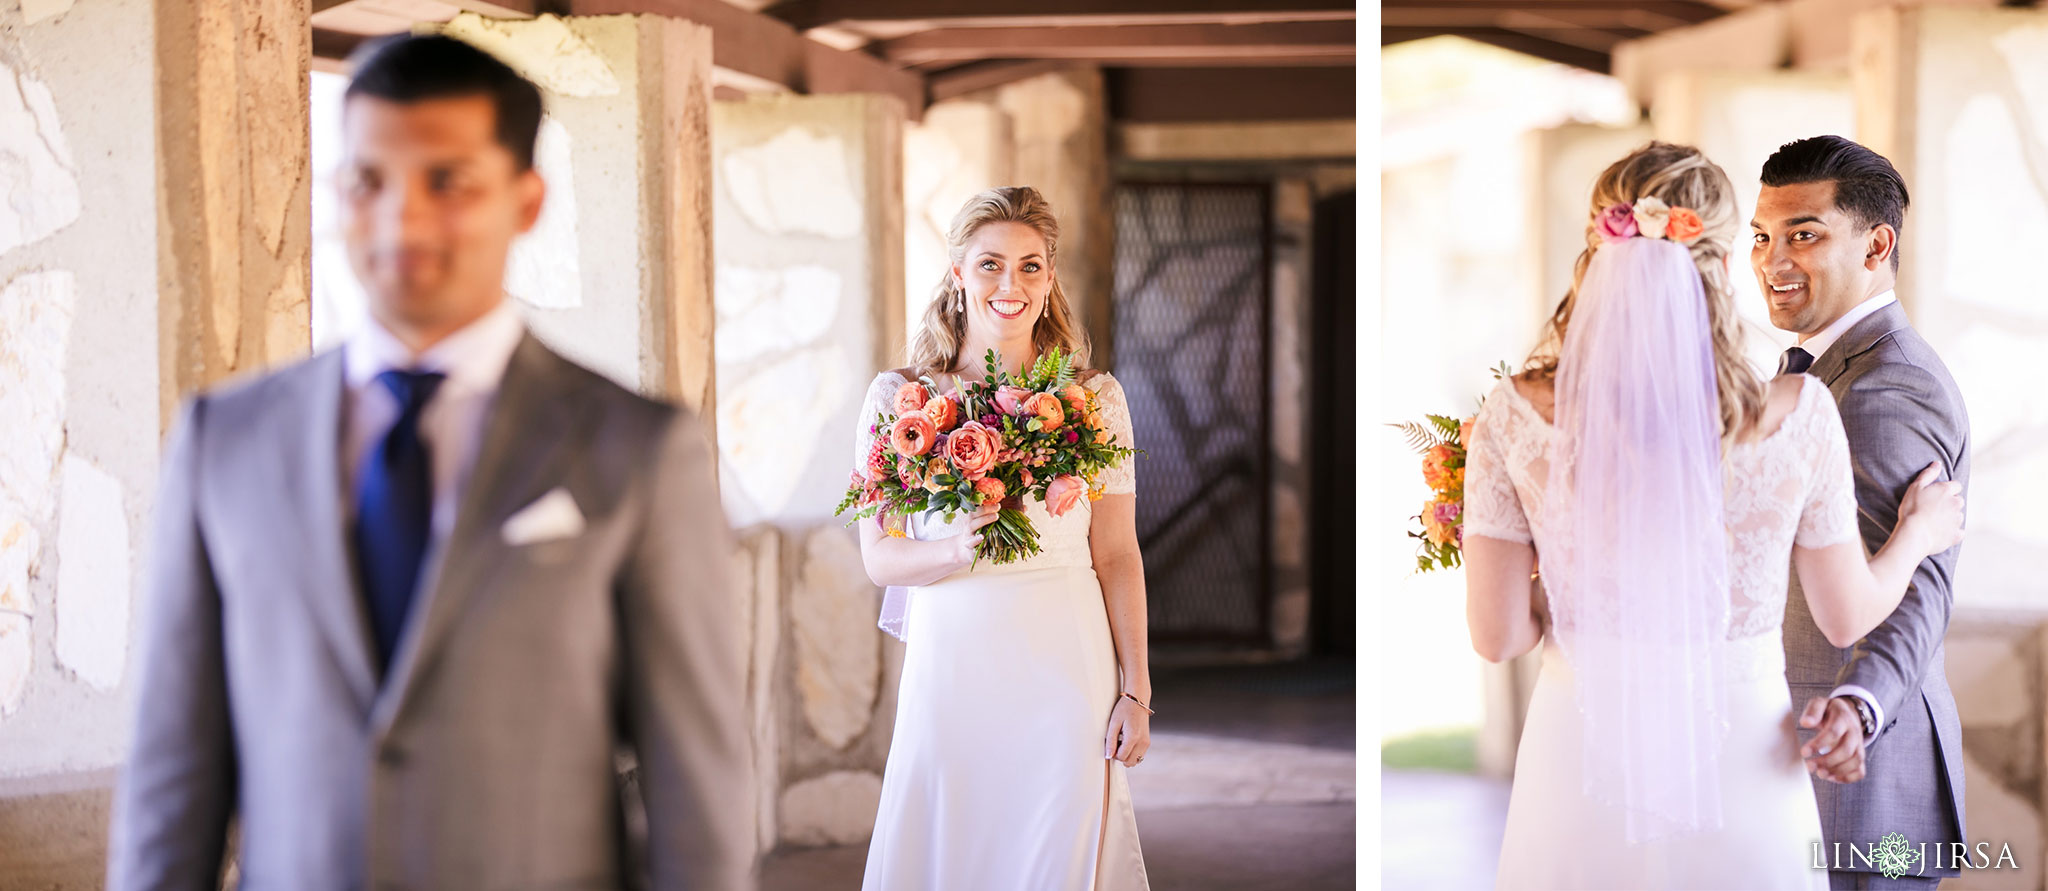 12 wayfarers chapel palos verdes wedding photography